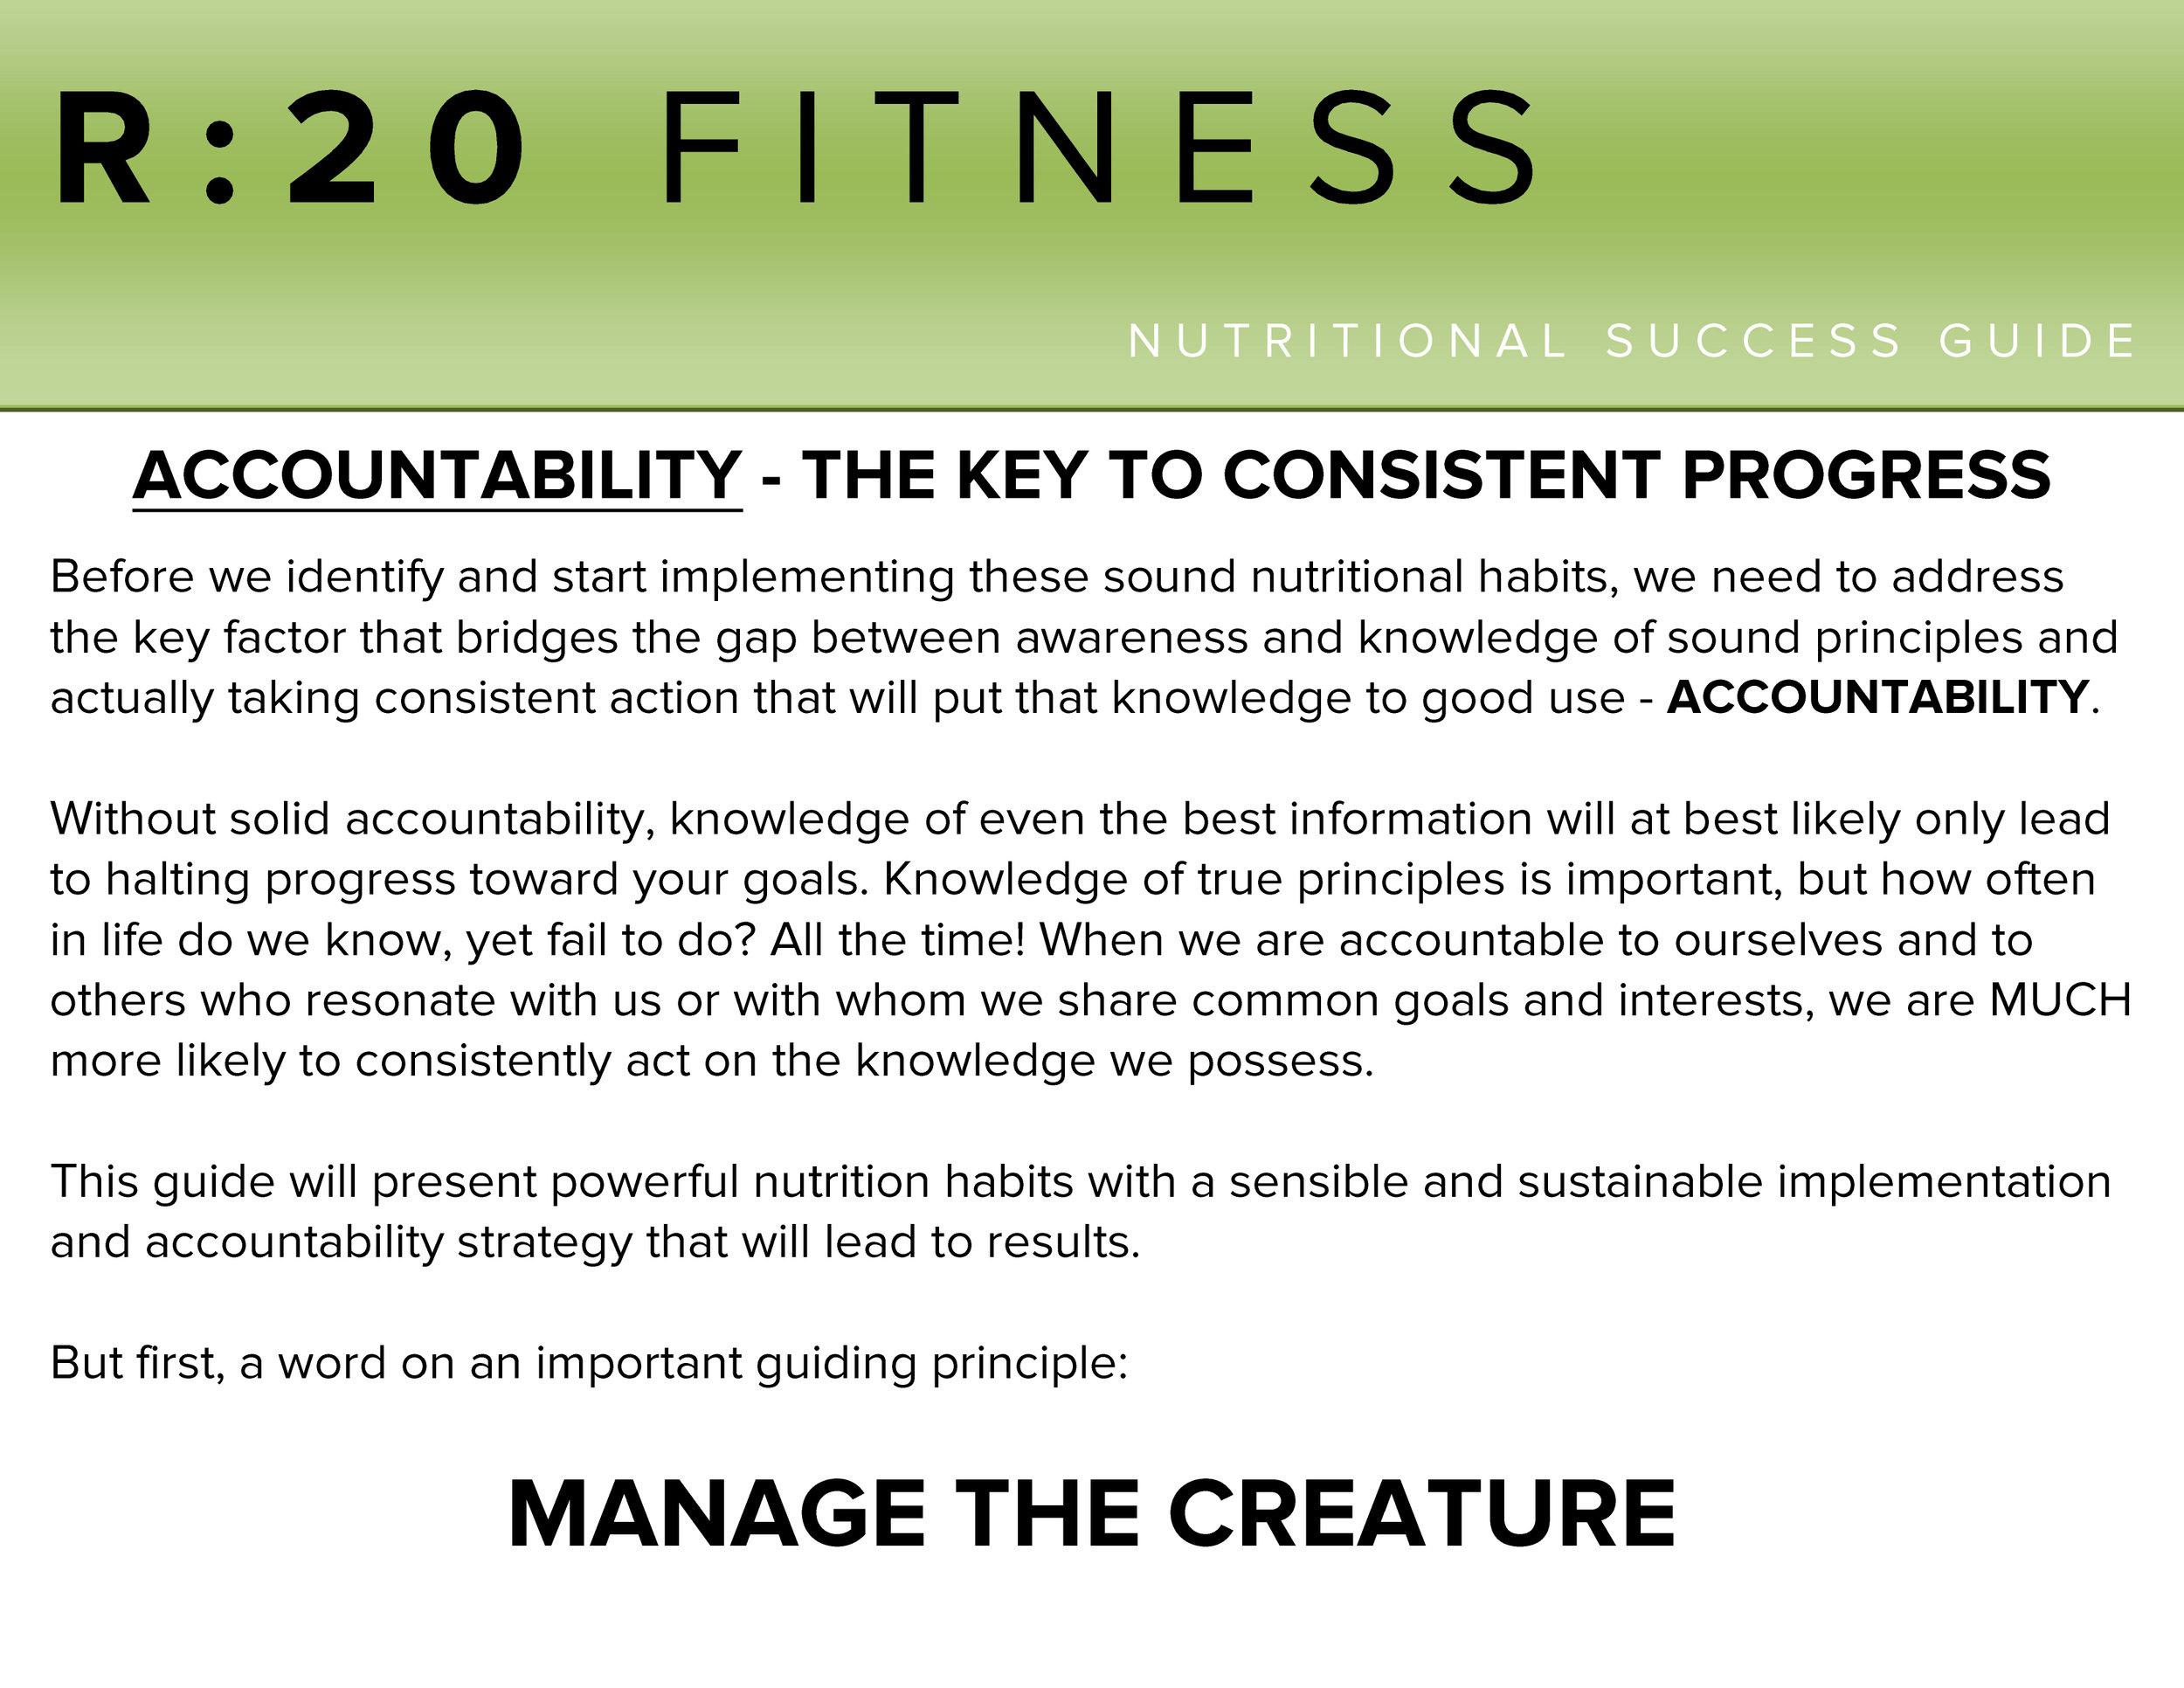 R20 1.0 Nutritional Success Guide-3.jpg